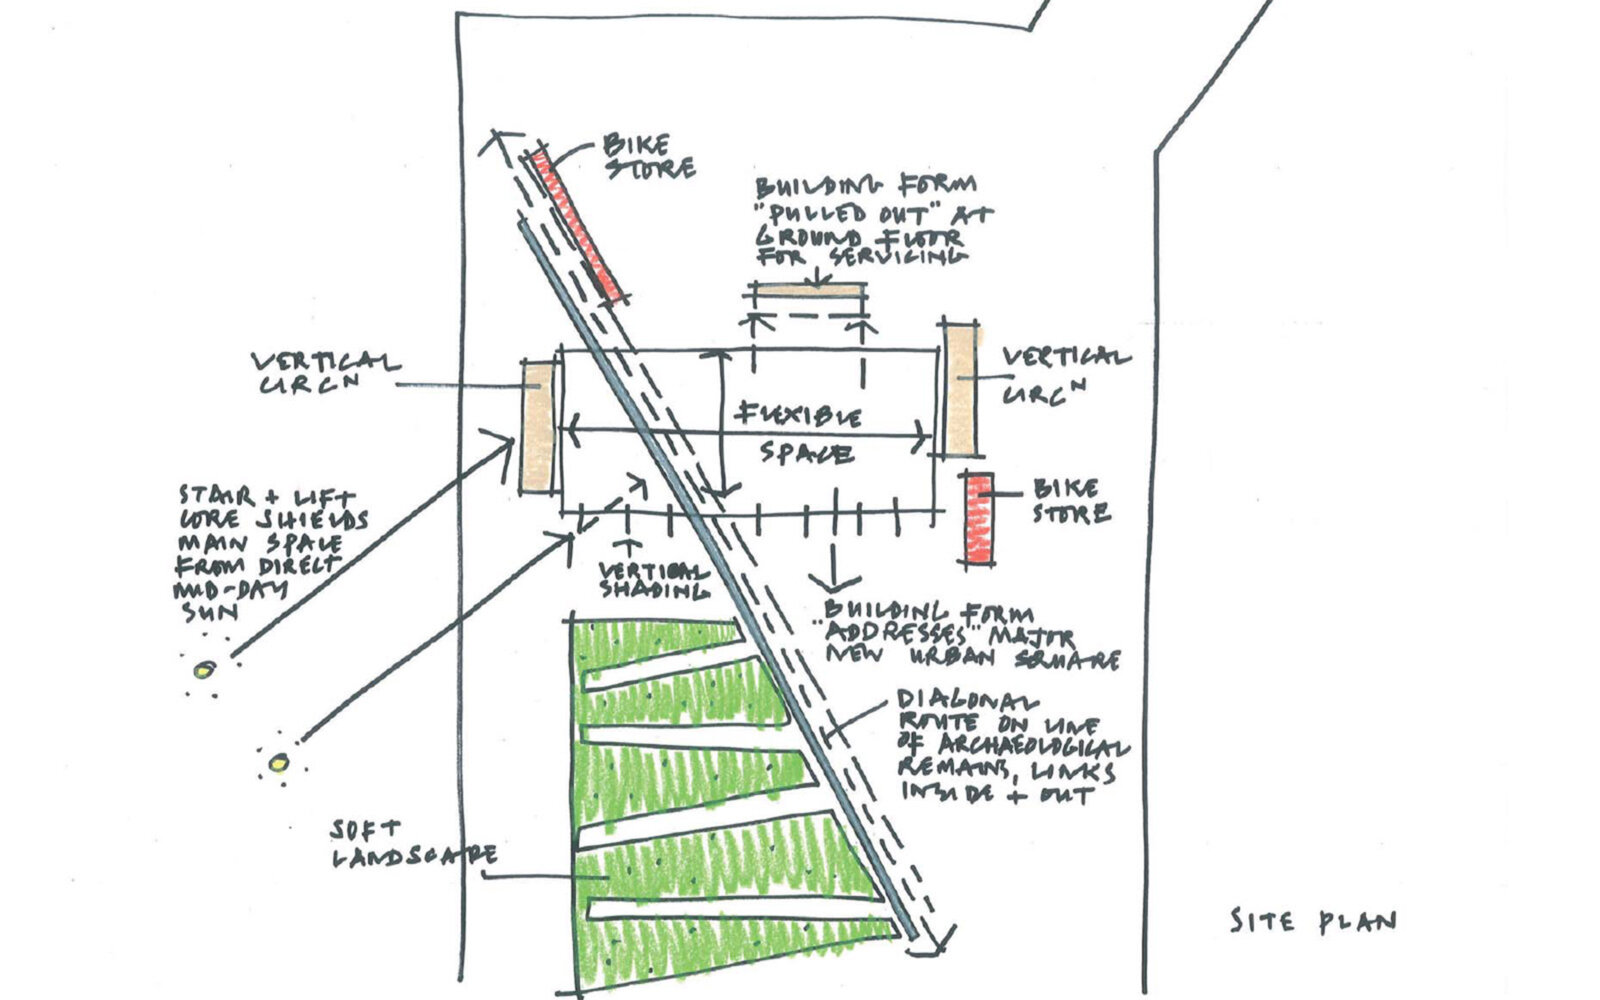 Clay Farm Community Centre site plan sketch